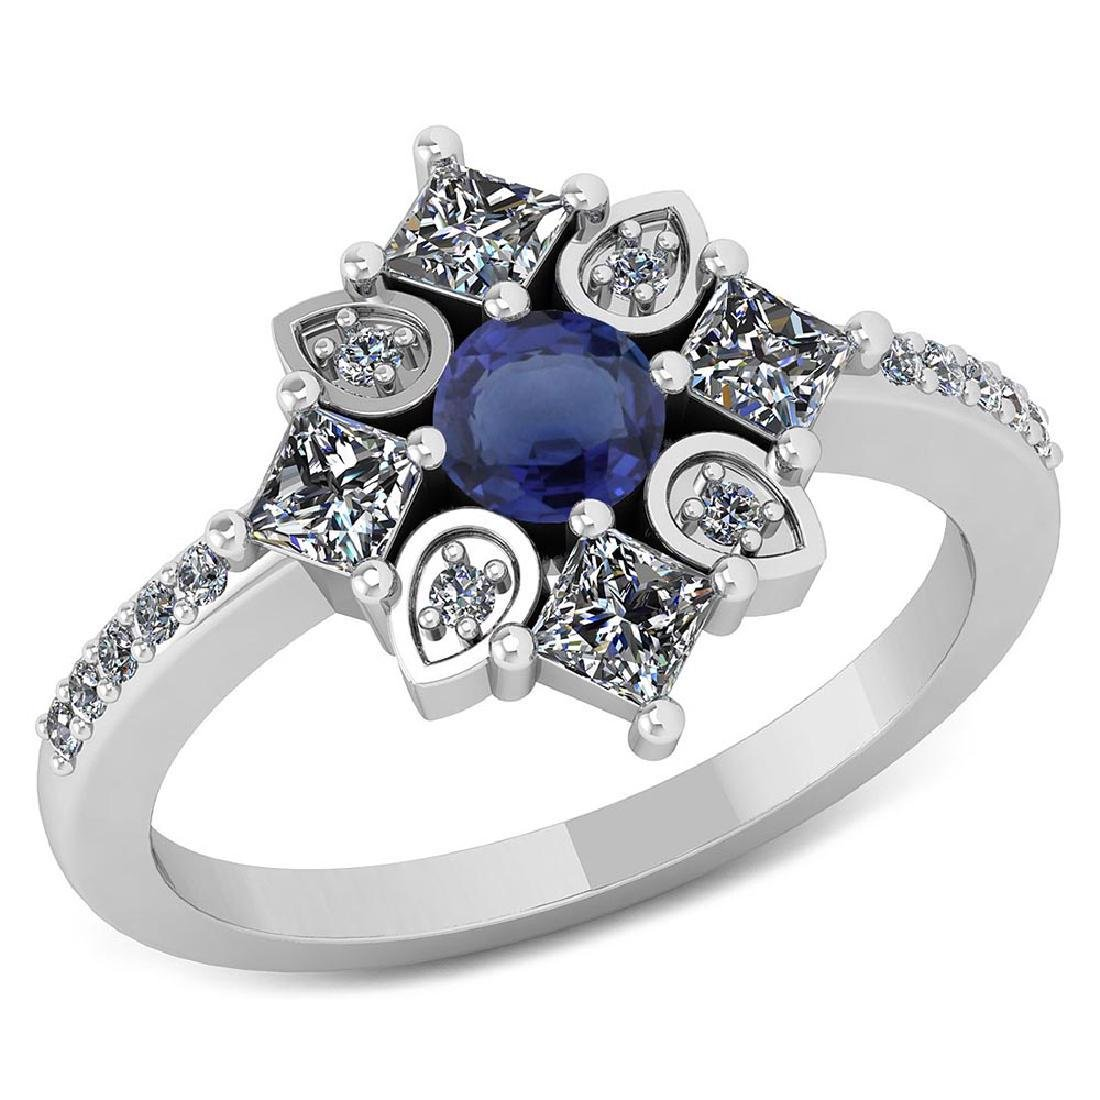 Certified .54 CTW Genuine Blue Sapphire And Diamond 14K